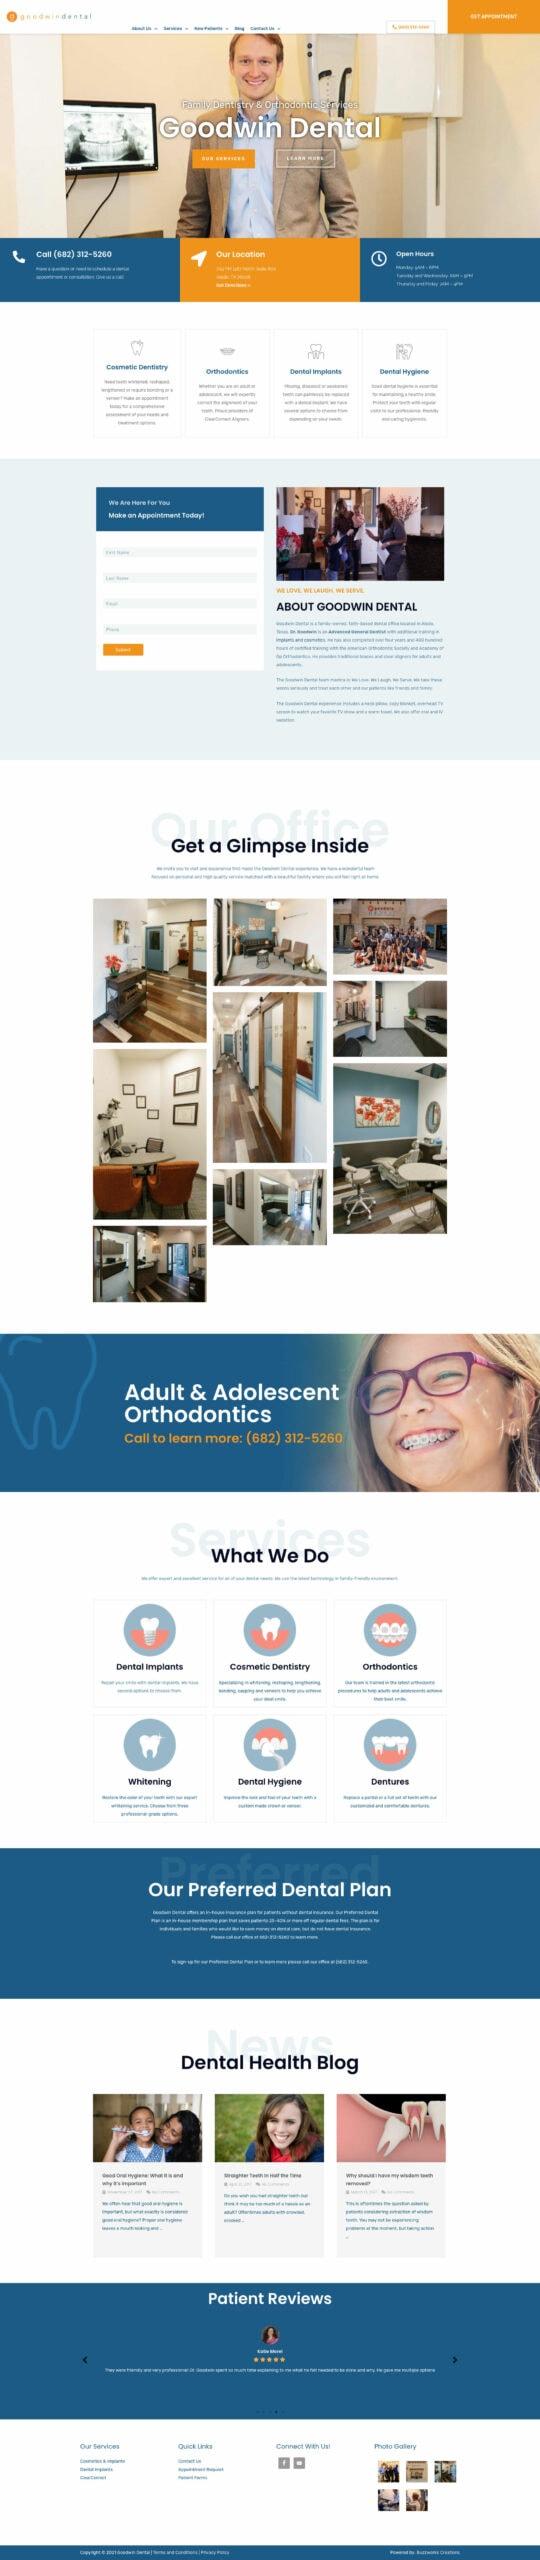 Goodwin-Dental-Website-homepage